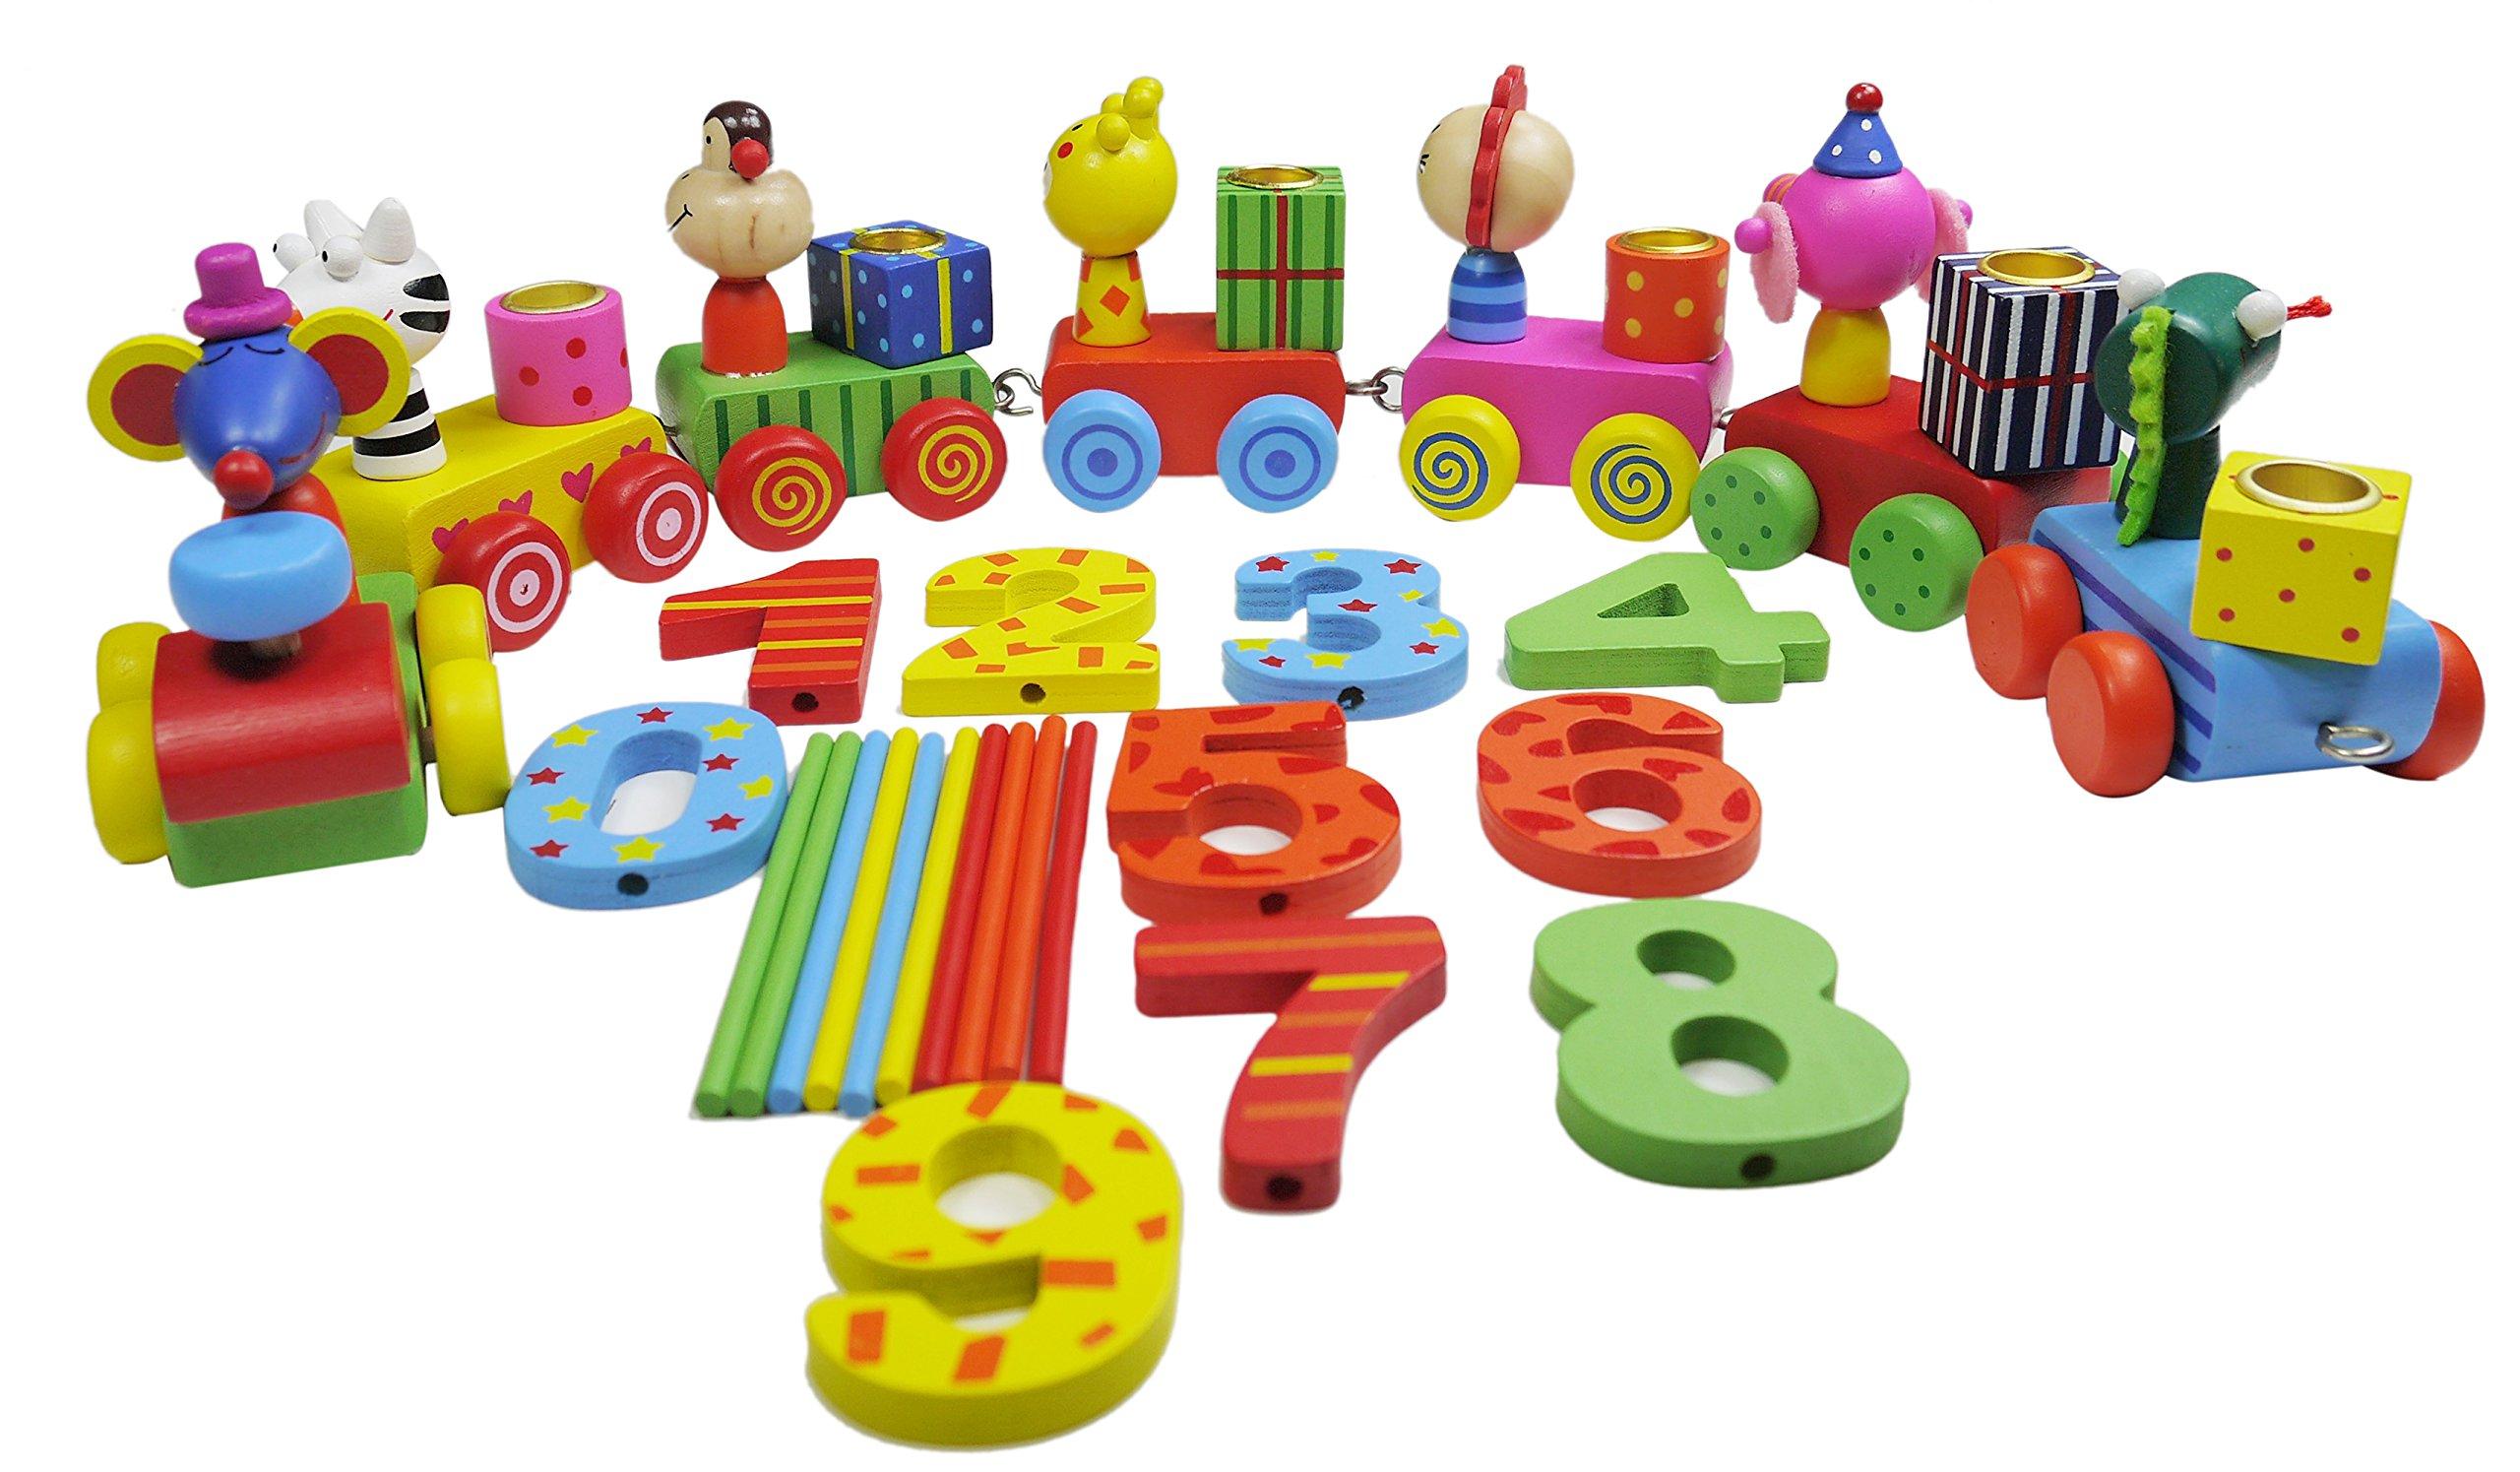 khevga Birthday Train Birthday-Decoration for Girls and Boys